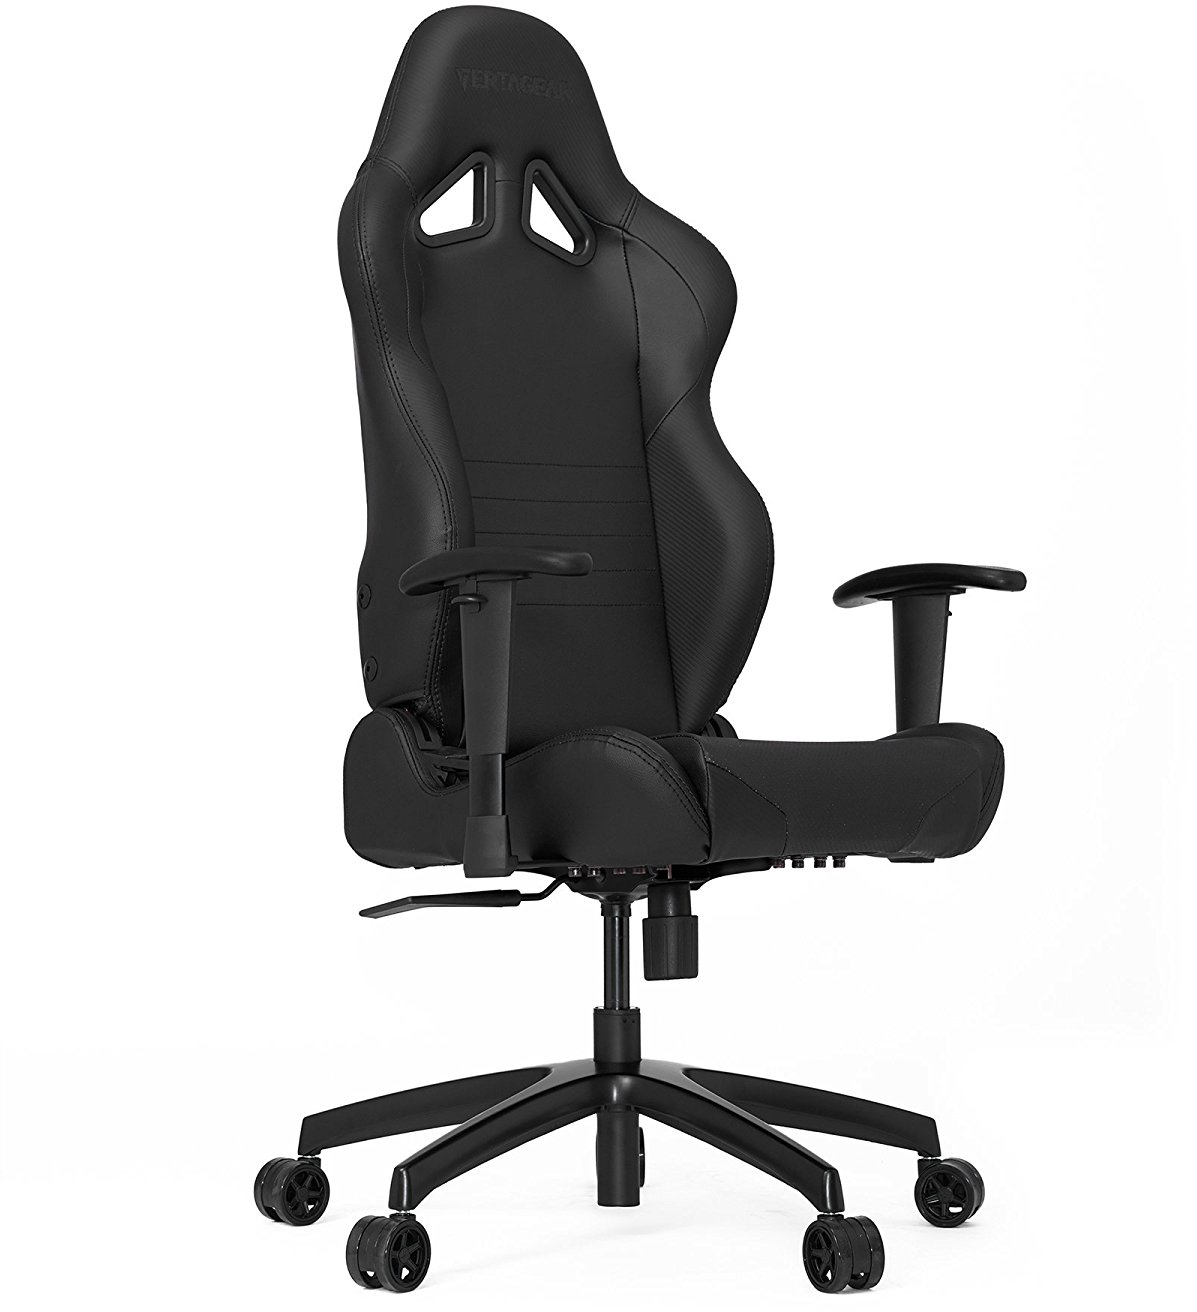 Racing Series S-Line arozzi torretta orange v2 игровое кресло